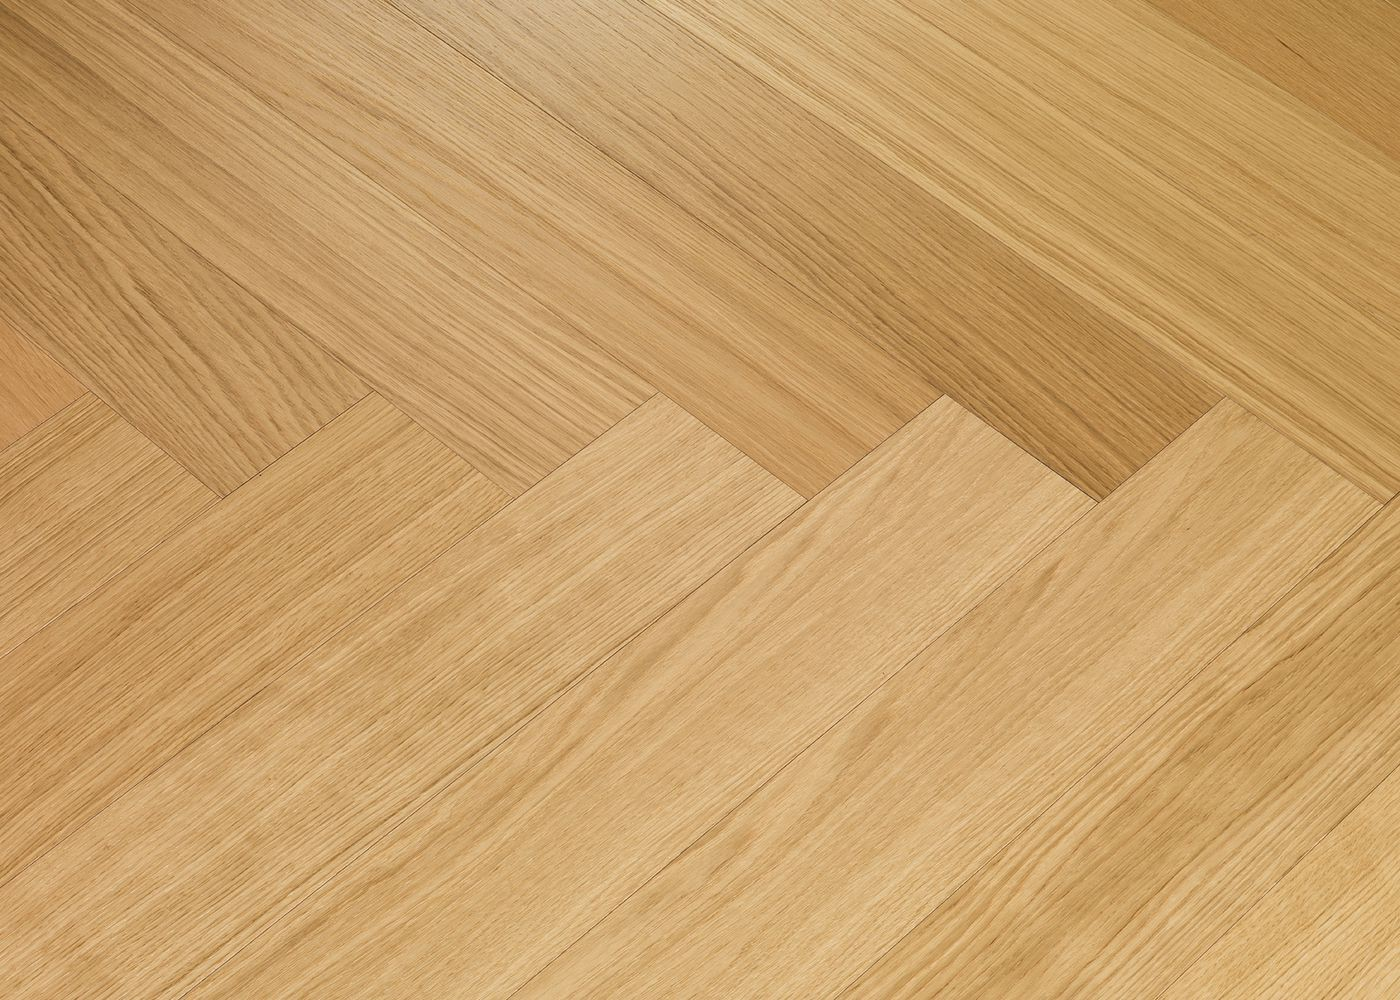 Sol plaqué bois Chêne SALZBOURG brossé vernis extra-mat - Swing - Select 10x121x593